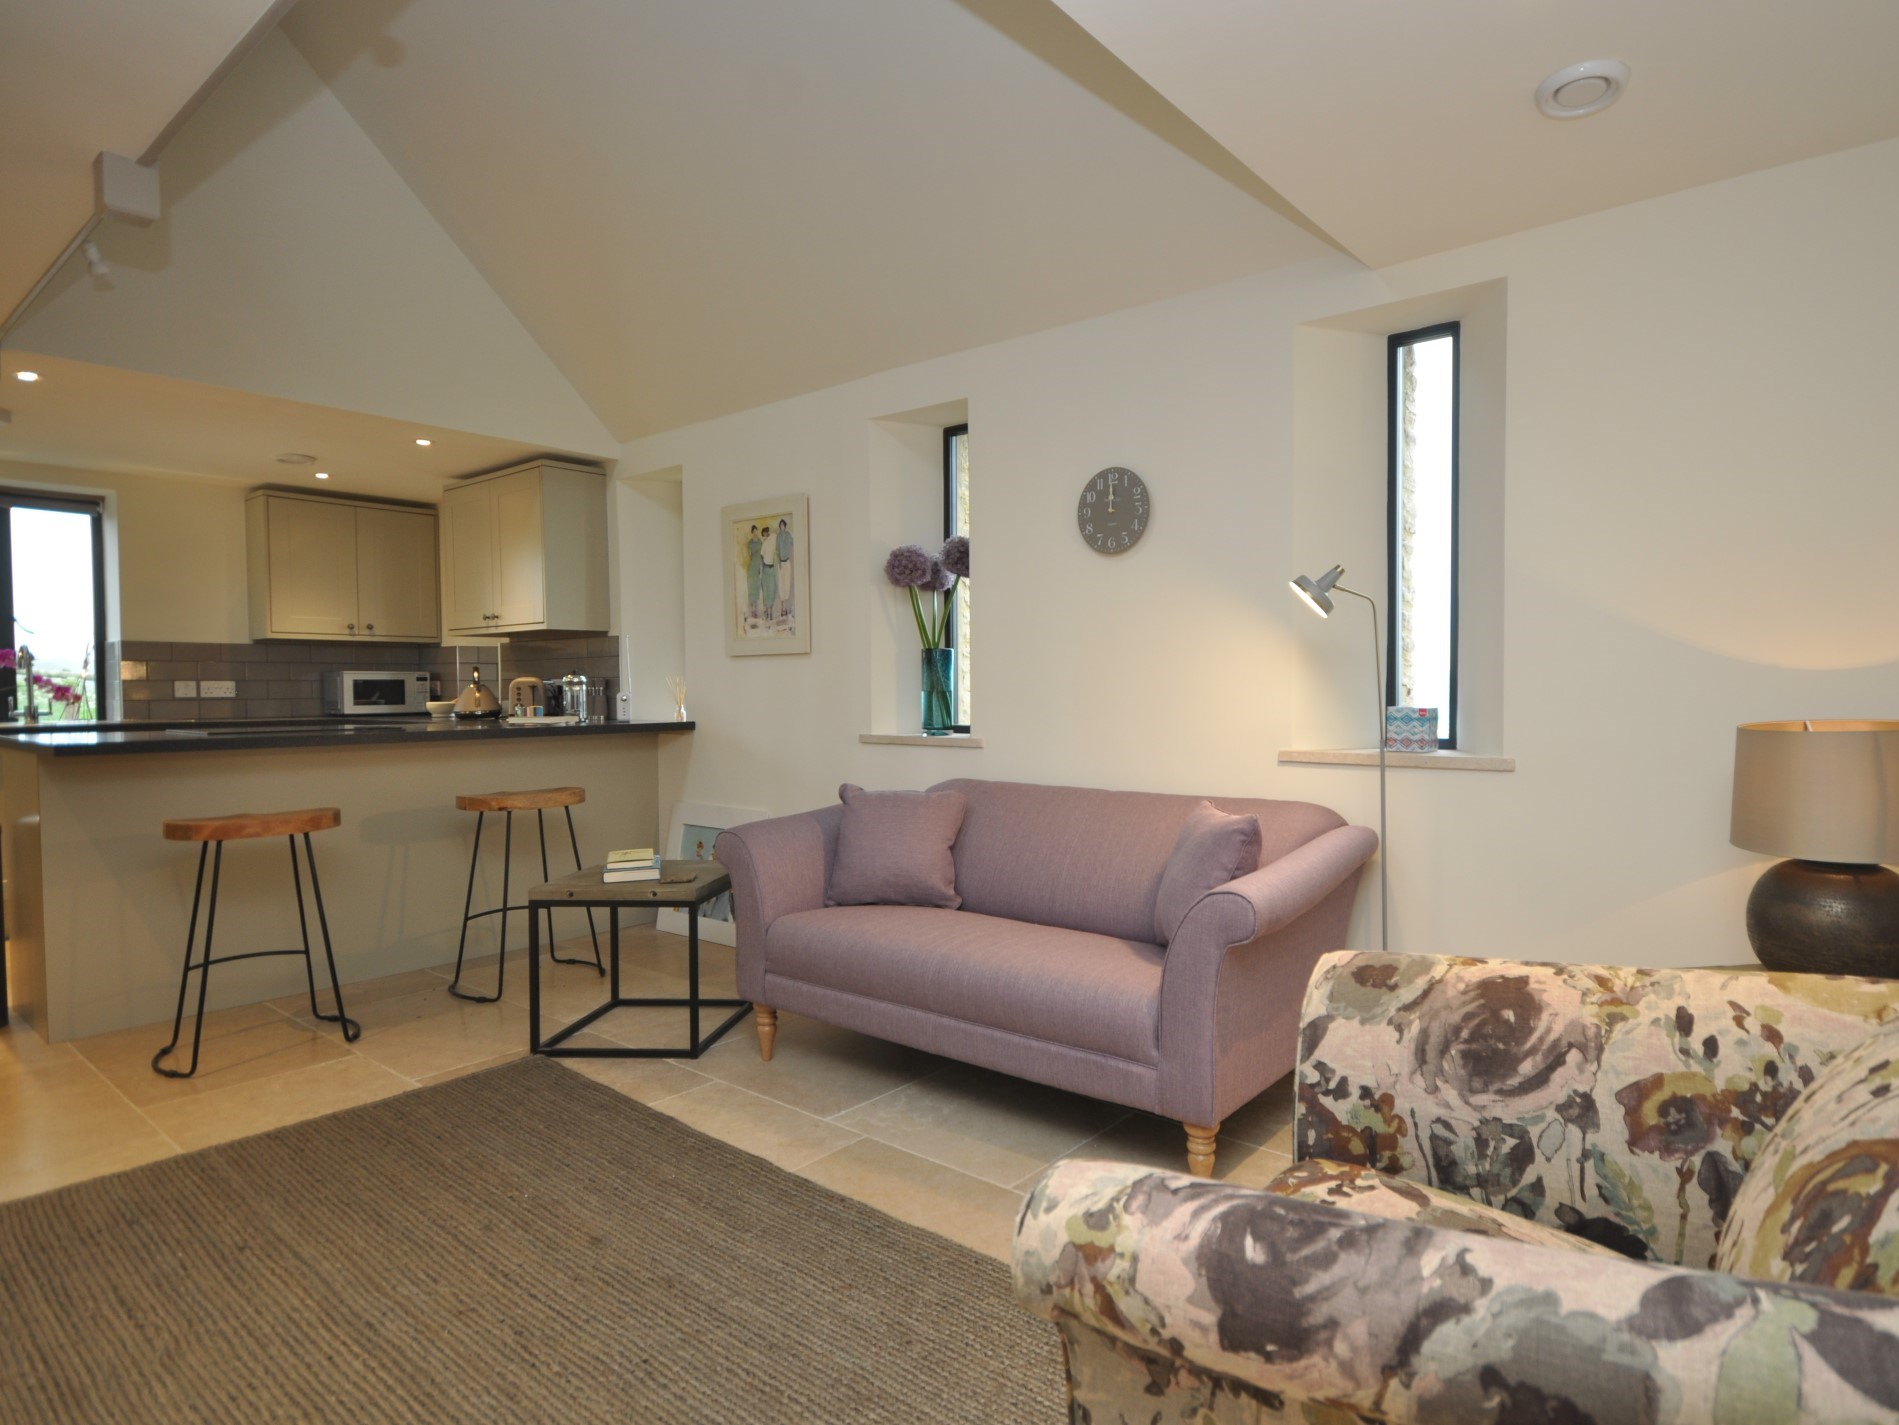 Stylish open-plan lounge area